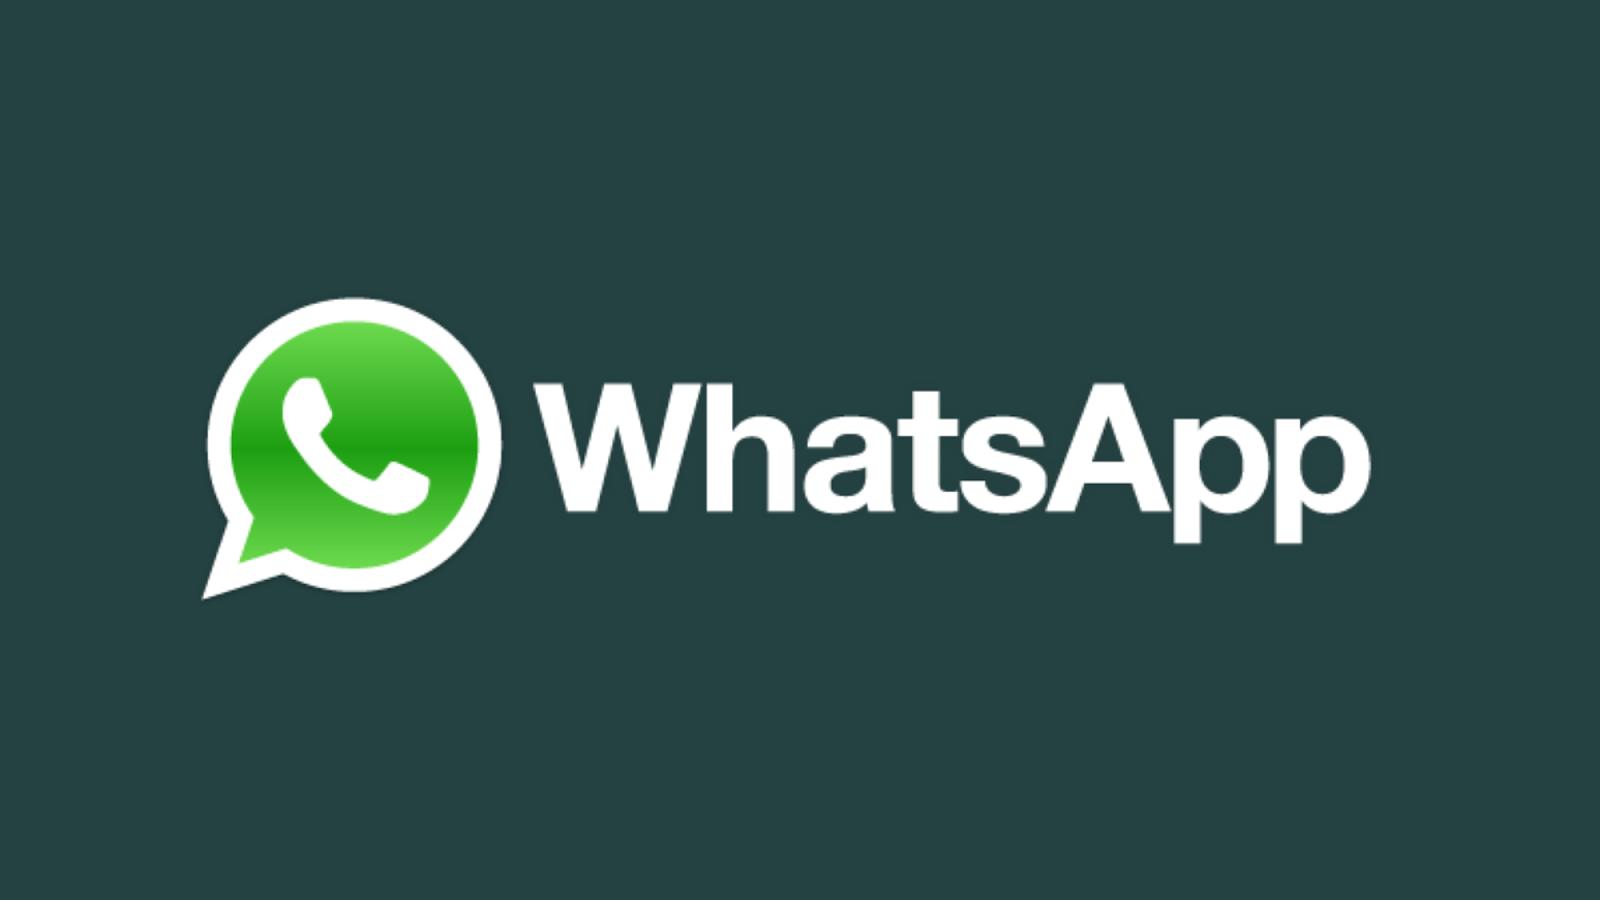 Top Whatsapp Status Hash One O One Whatsapp Status